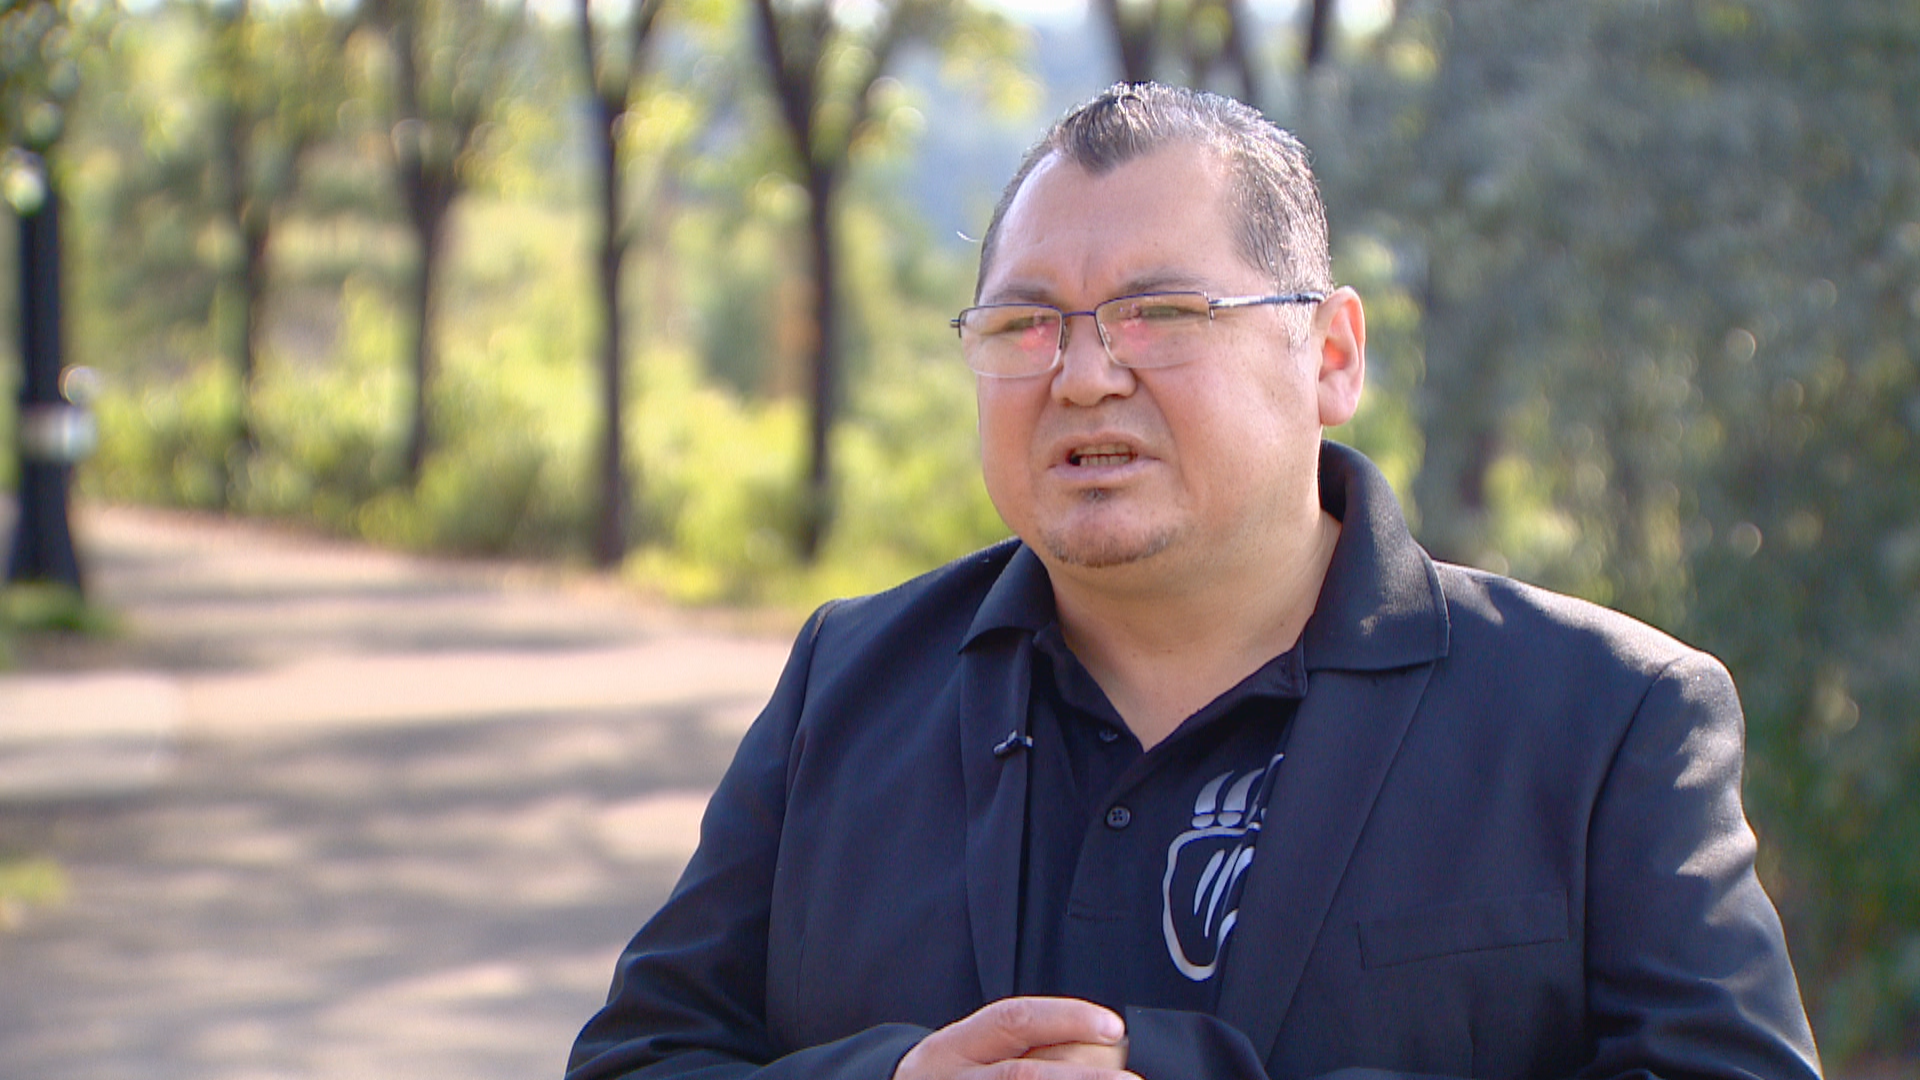 Papaschase First Nation Chief Calvin Bruneau. (CBC Edmonton)